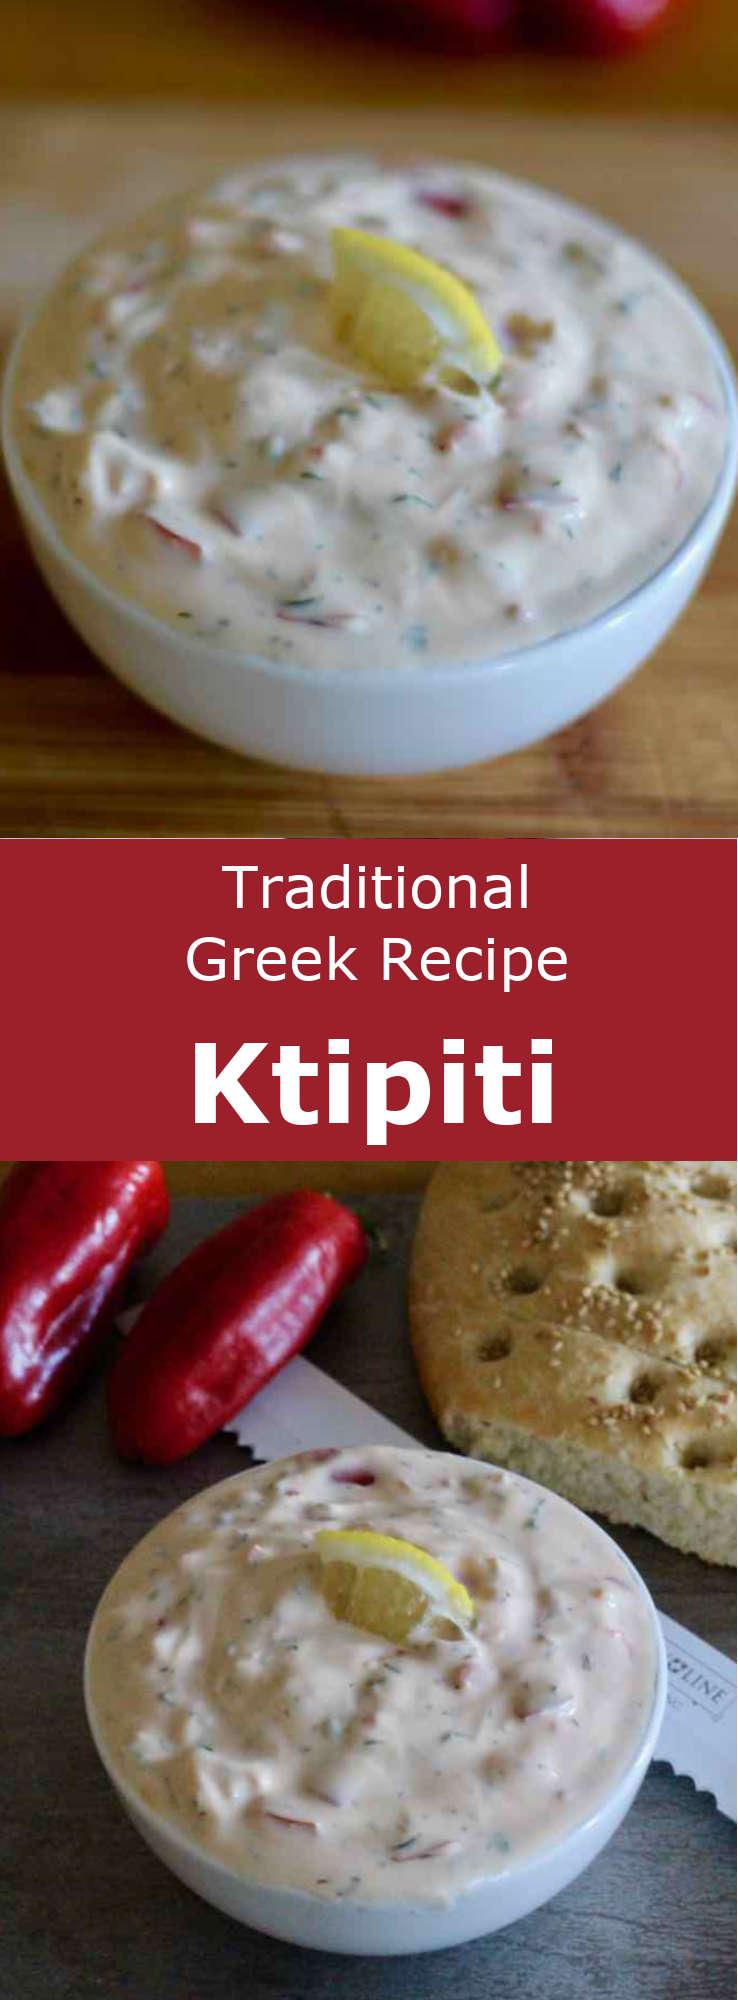 Ktipiti, tirokafteri or kopanisti is a delicious Greek meze (appetizer) prepared with feta cheese and roasted red bell peppers. #Greece #GreekCuisine #GreekFood #GreekRecipe #MediterraneanCuisine #WorldCuisine #196flavors